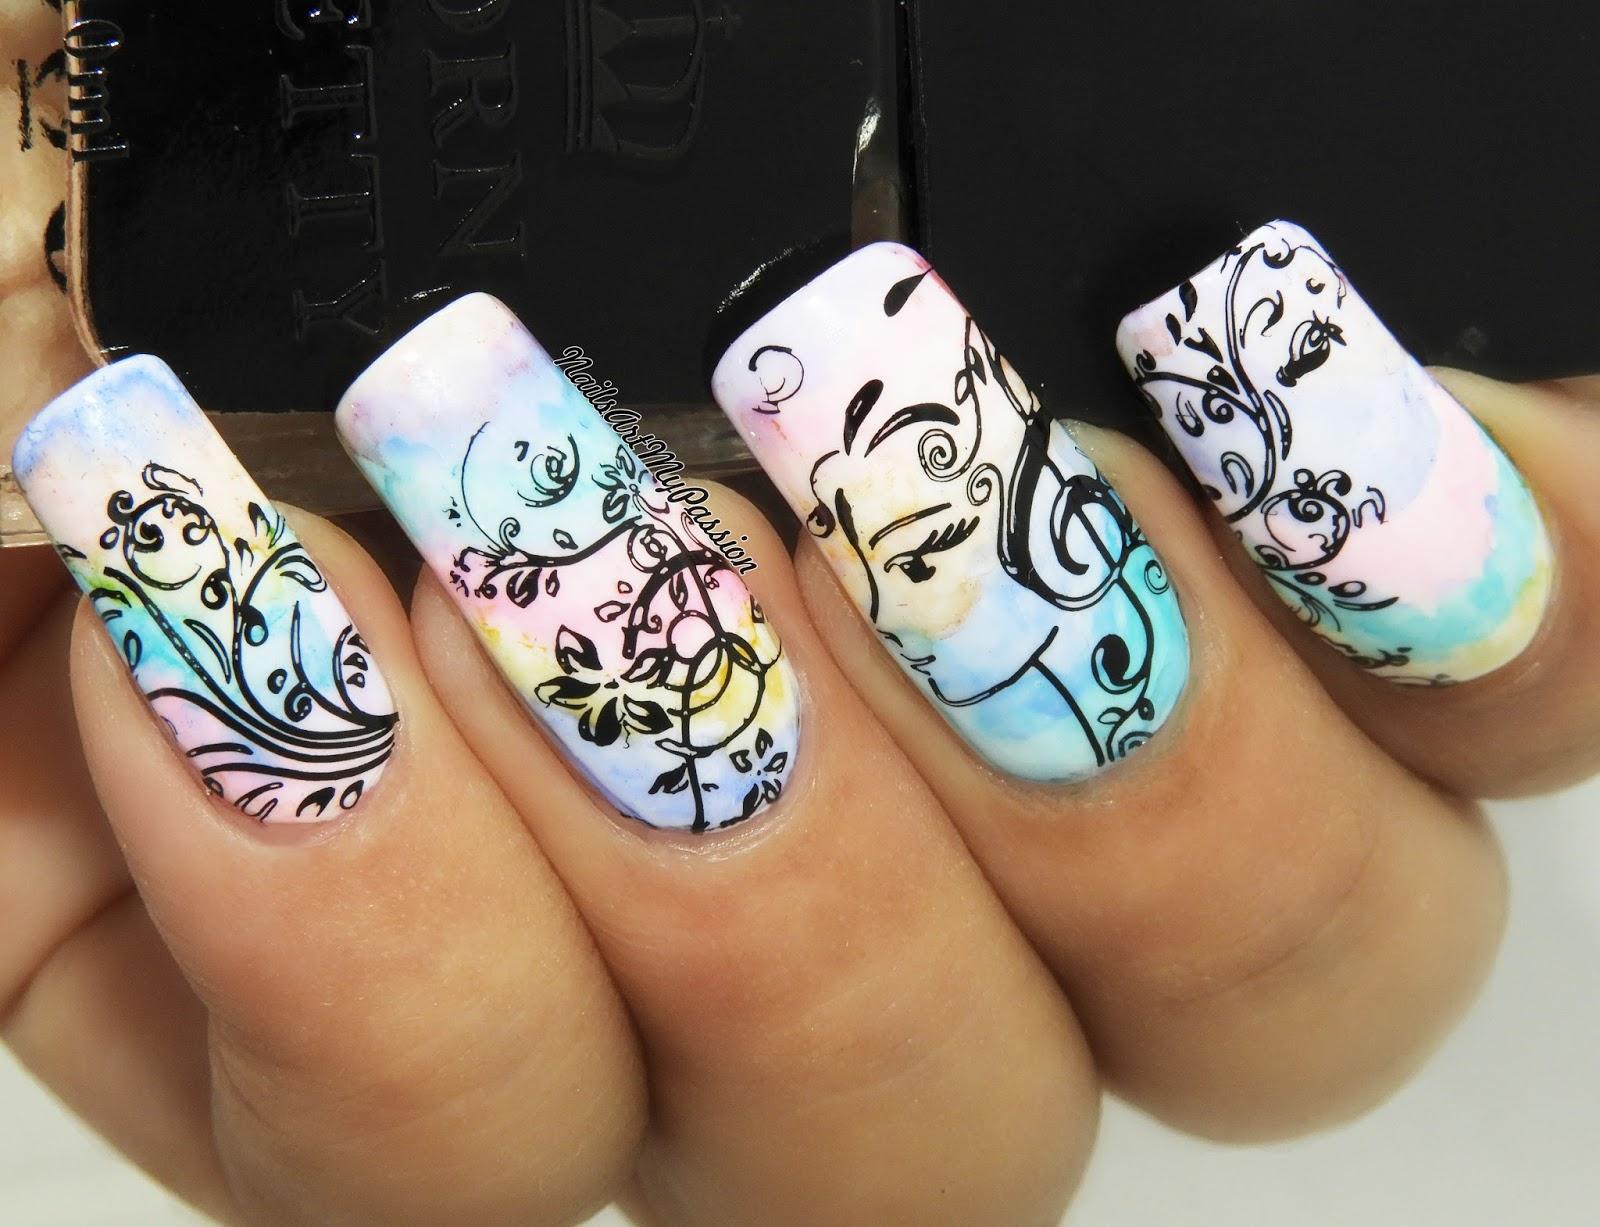 Nail Art My Passion: DIY Swirly nails with BP-X43 ||BORN PRETTY ...